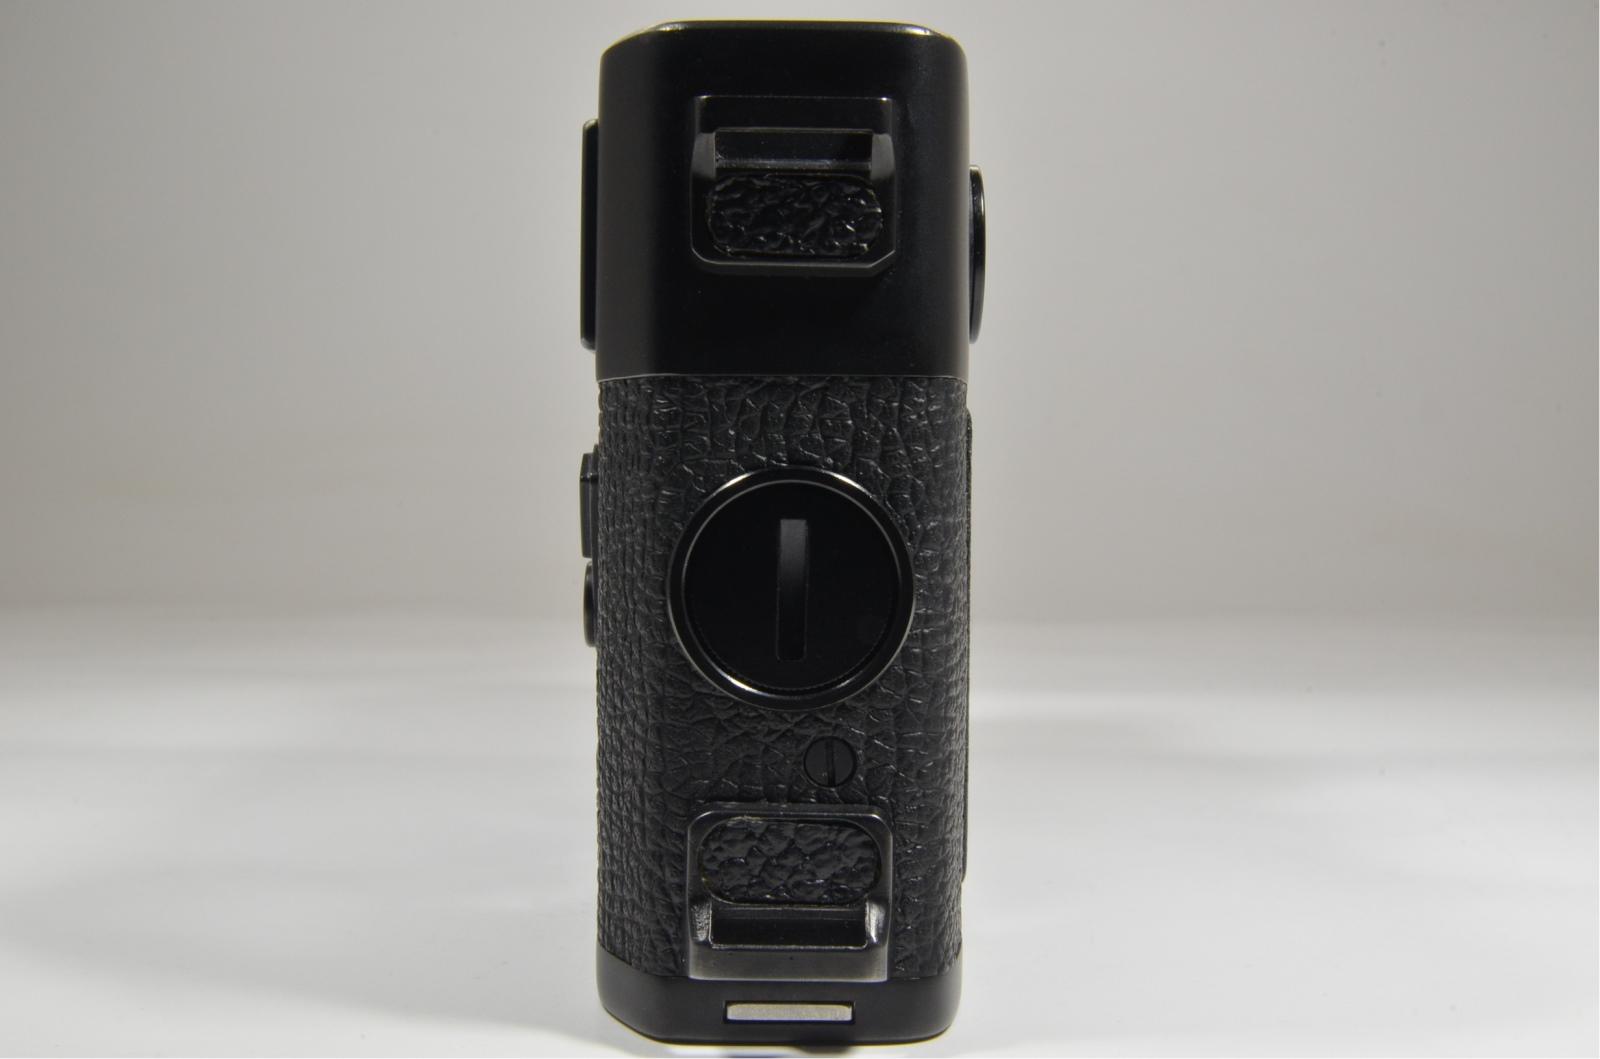 leica m5 black 3 lug year 1973 s/n 1376449 rangefinder camera